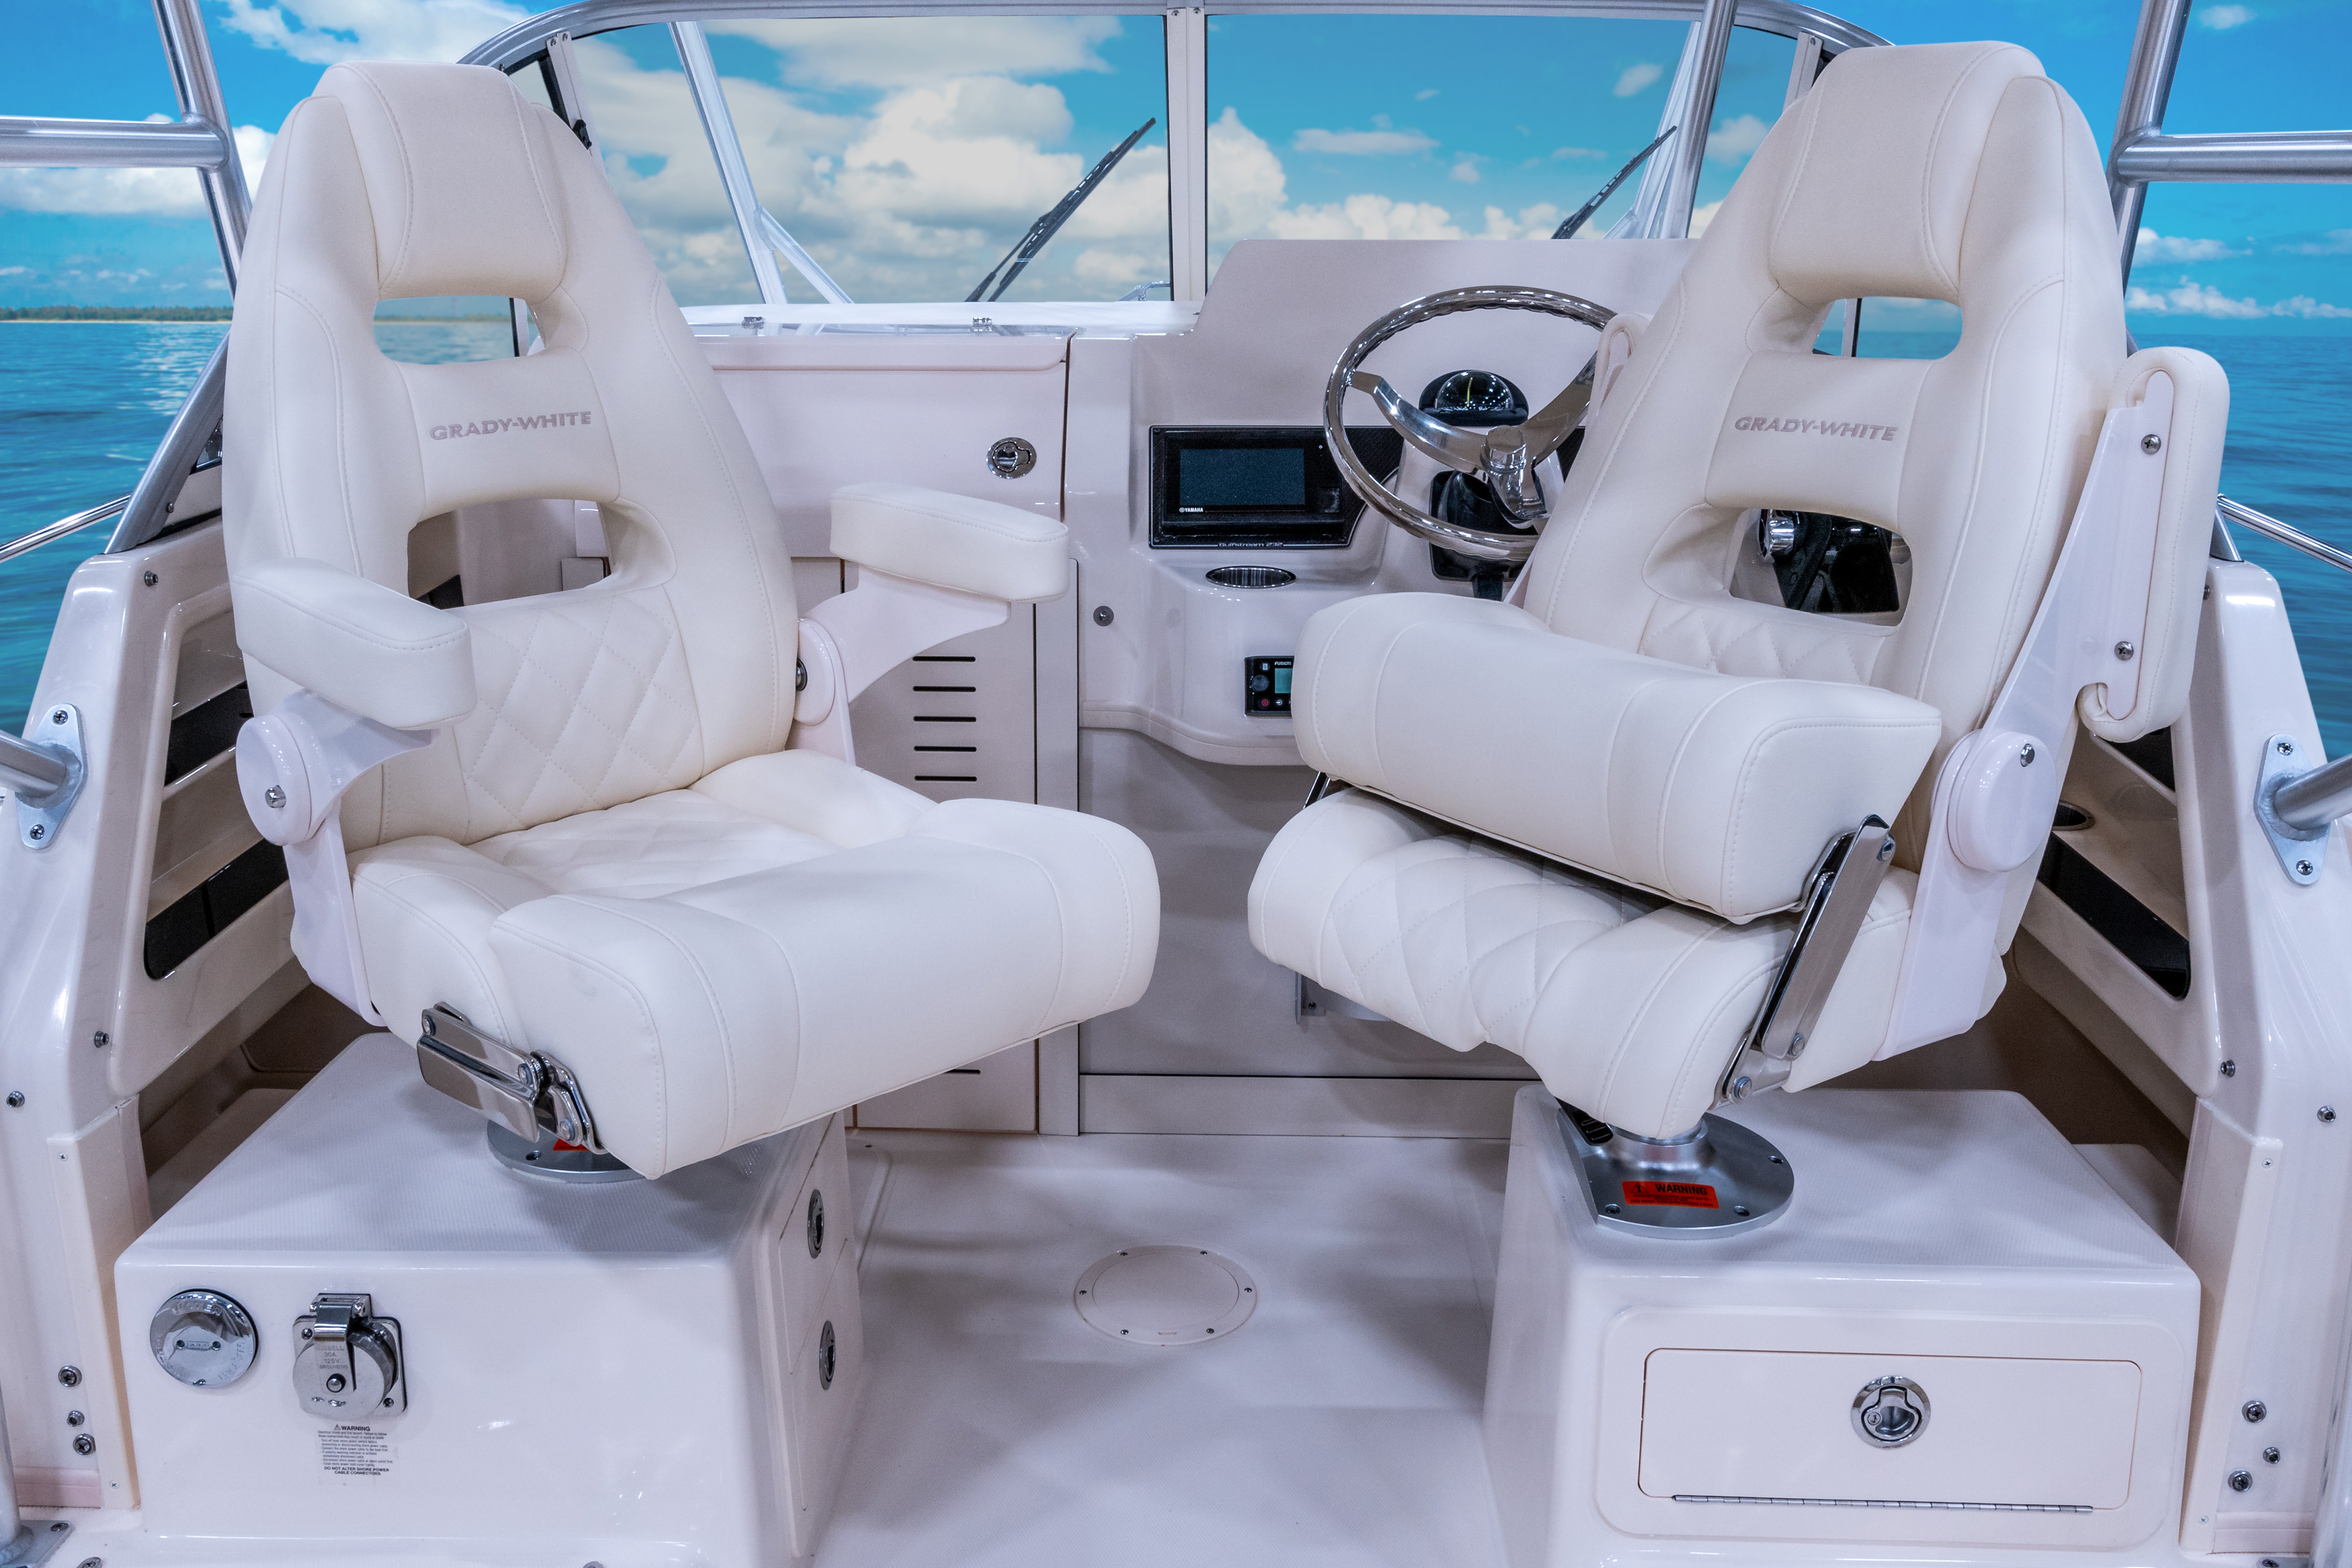 Gulfstream 232 Grady White 23 foot Walkaround Cabin Boat Command Elite Helm and Companion Chairs